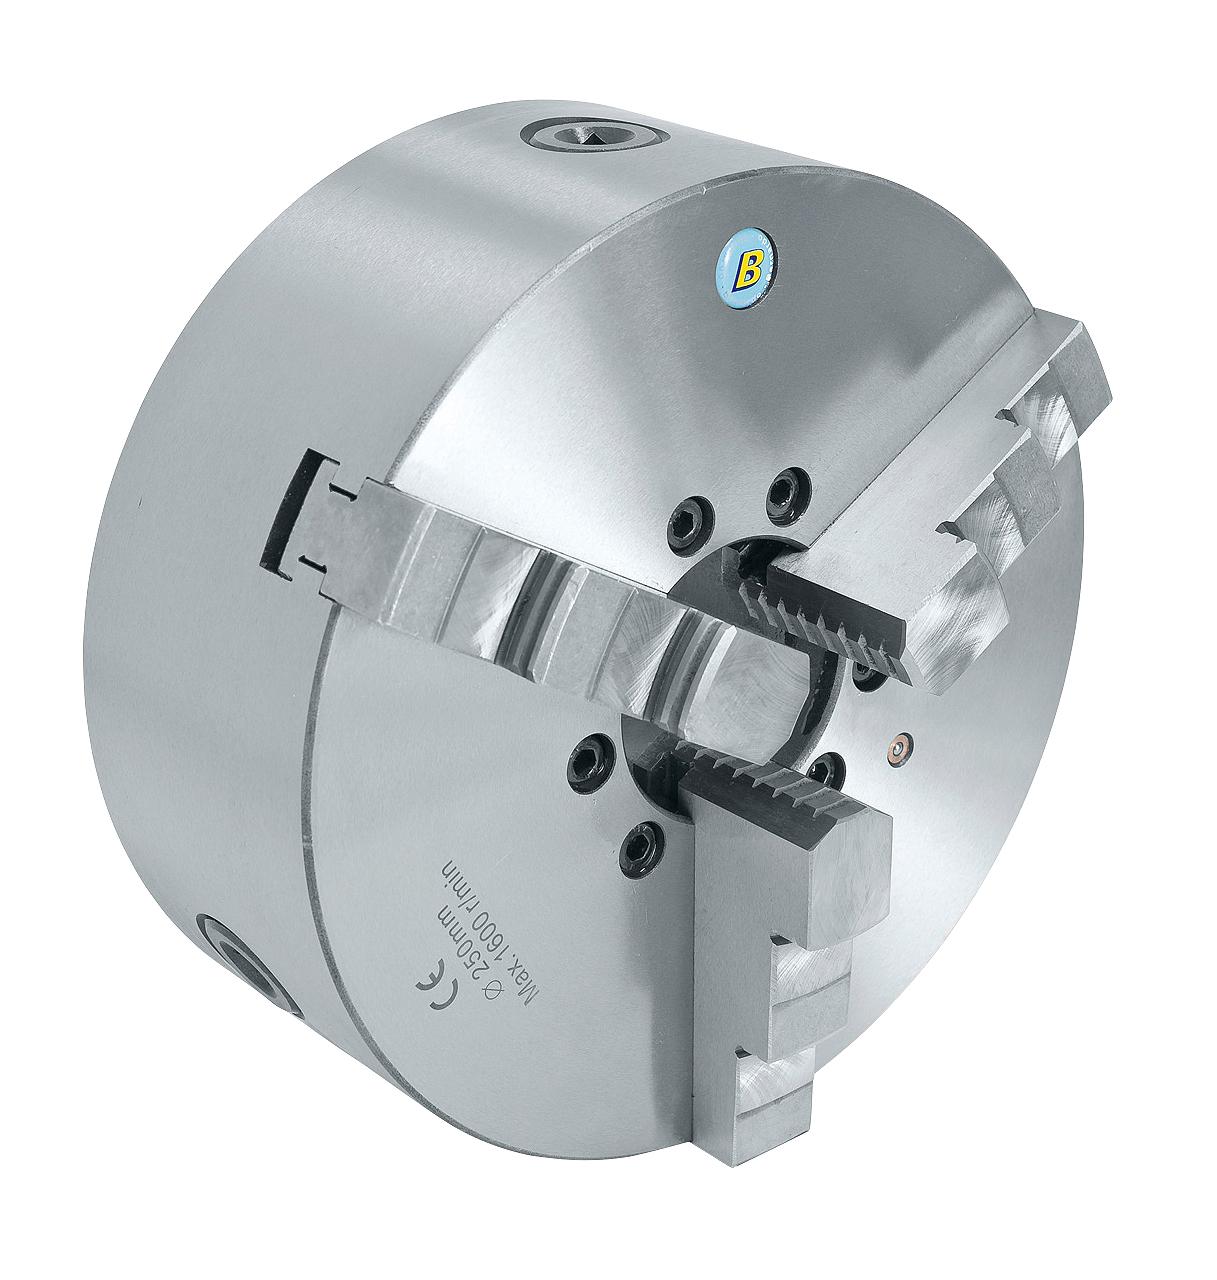 3 bakket centrerpatron standard DK11-250/D6